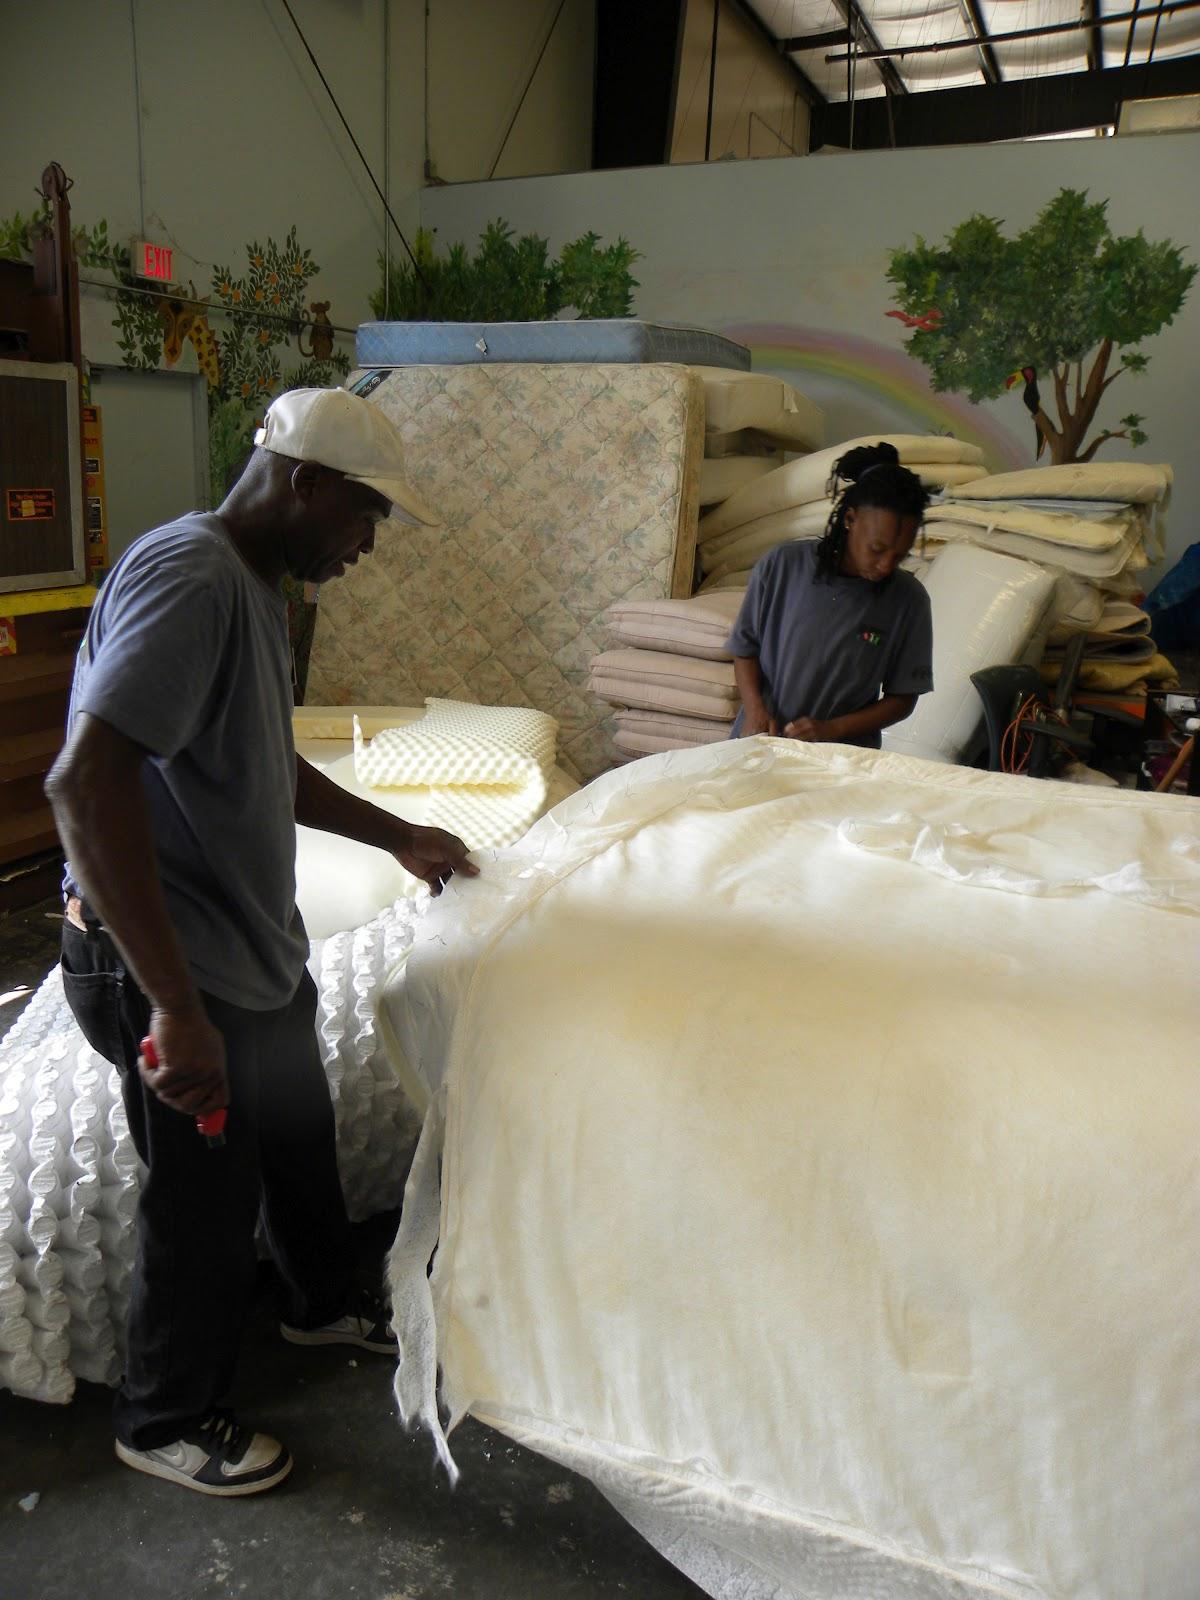 mattress recycling. Hard At Work Stripping A Mattress. Mattress Recycling S